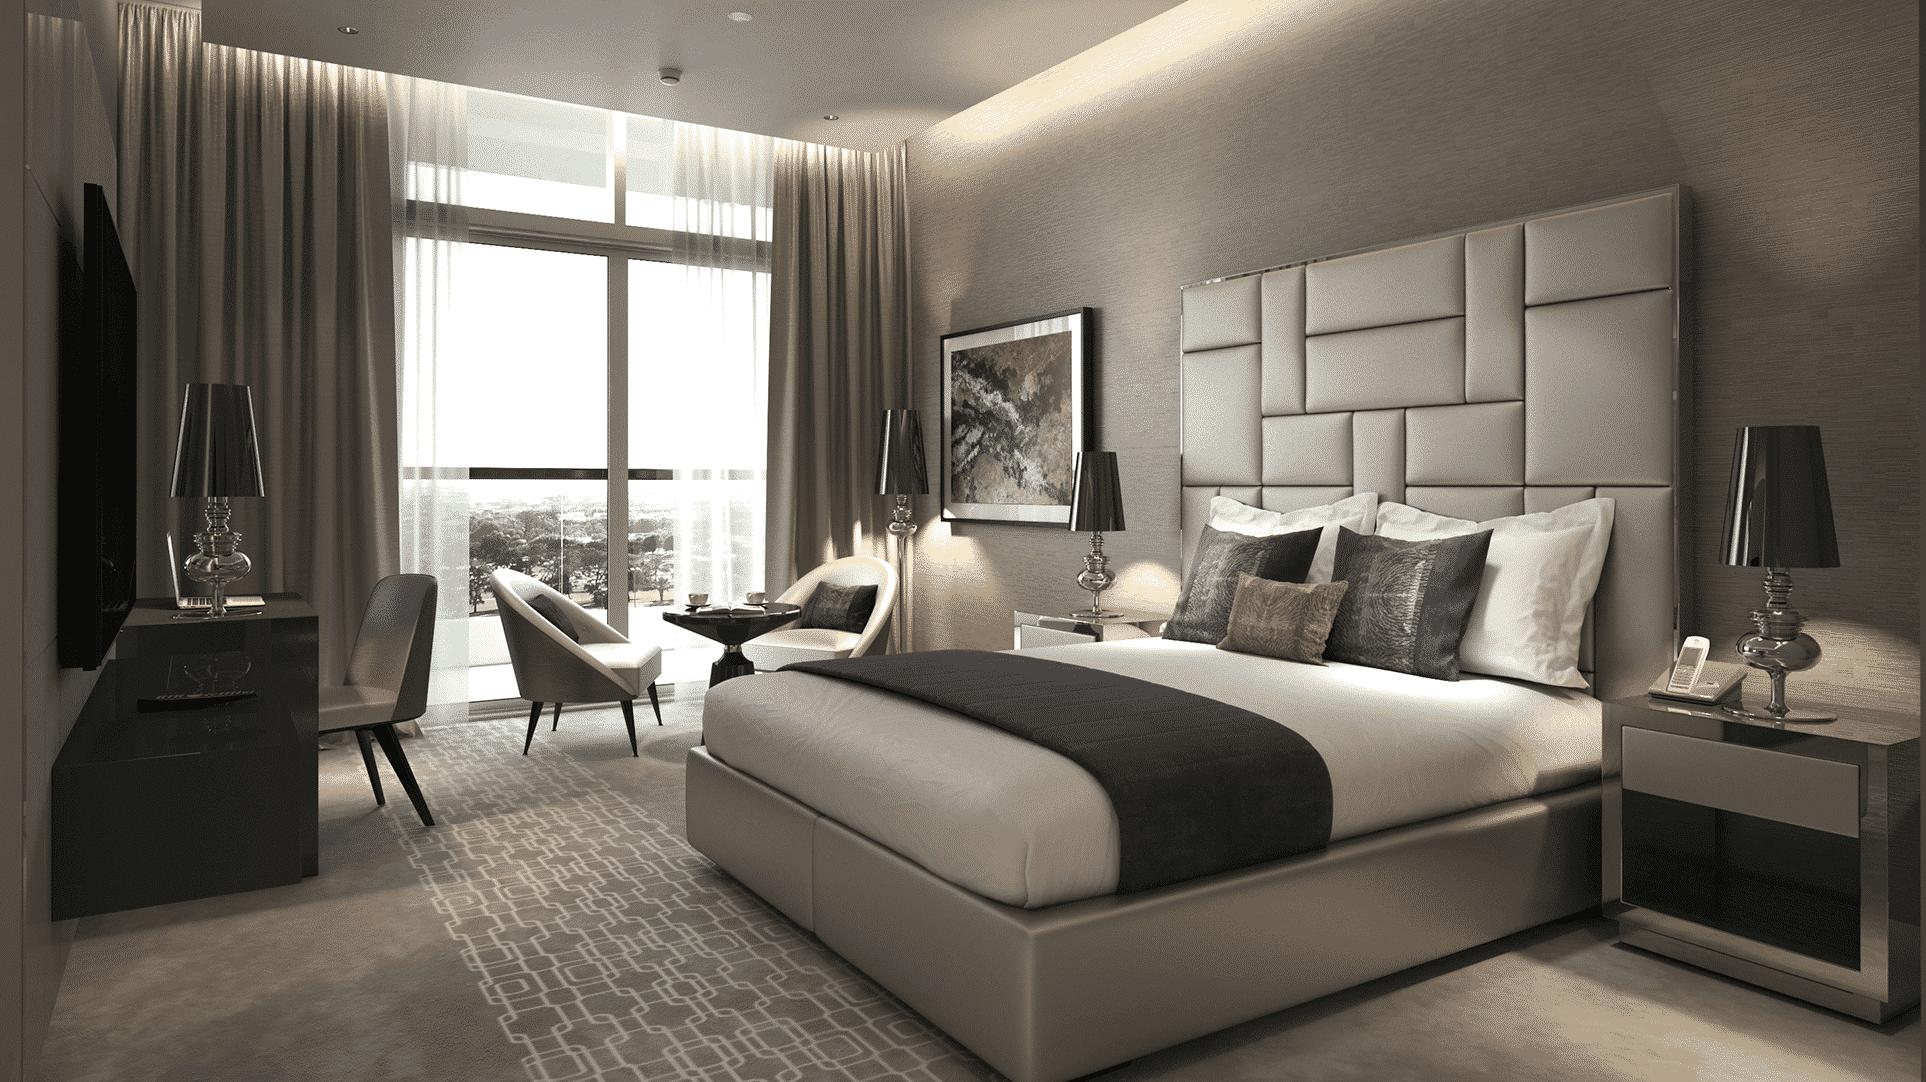 Kiara by Damac at Damac Hills. Luxury apartments for Sale in Dubai